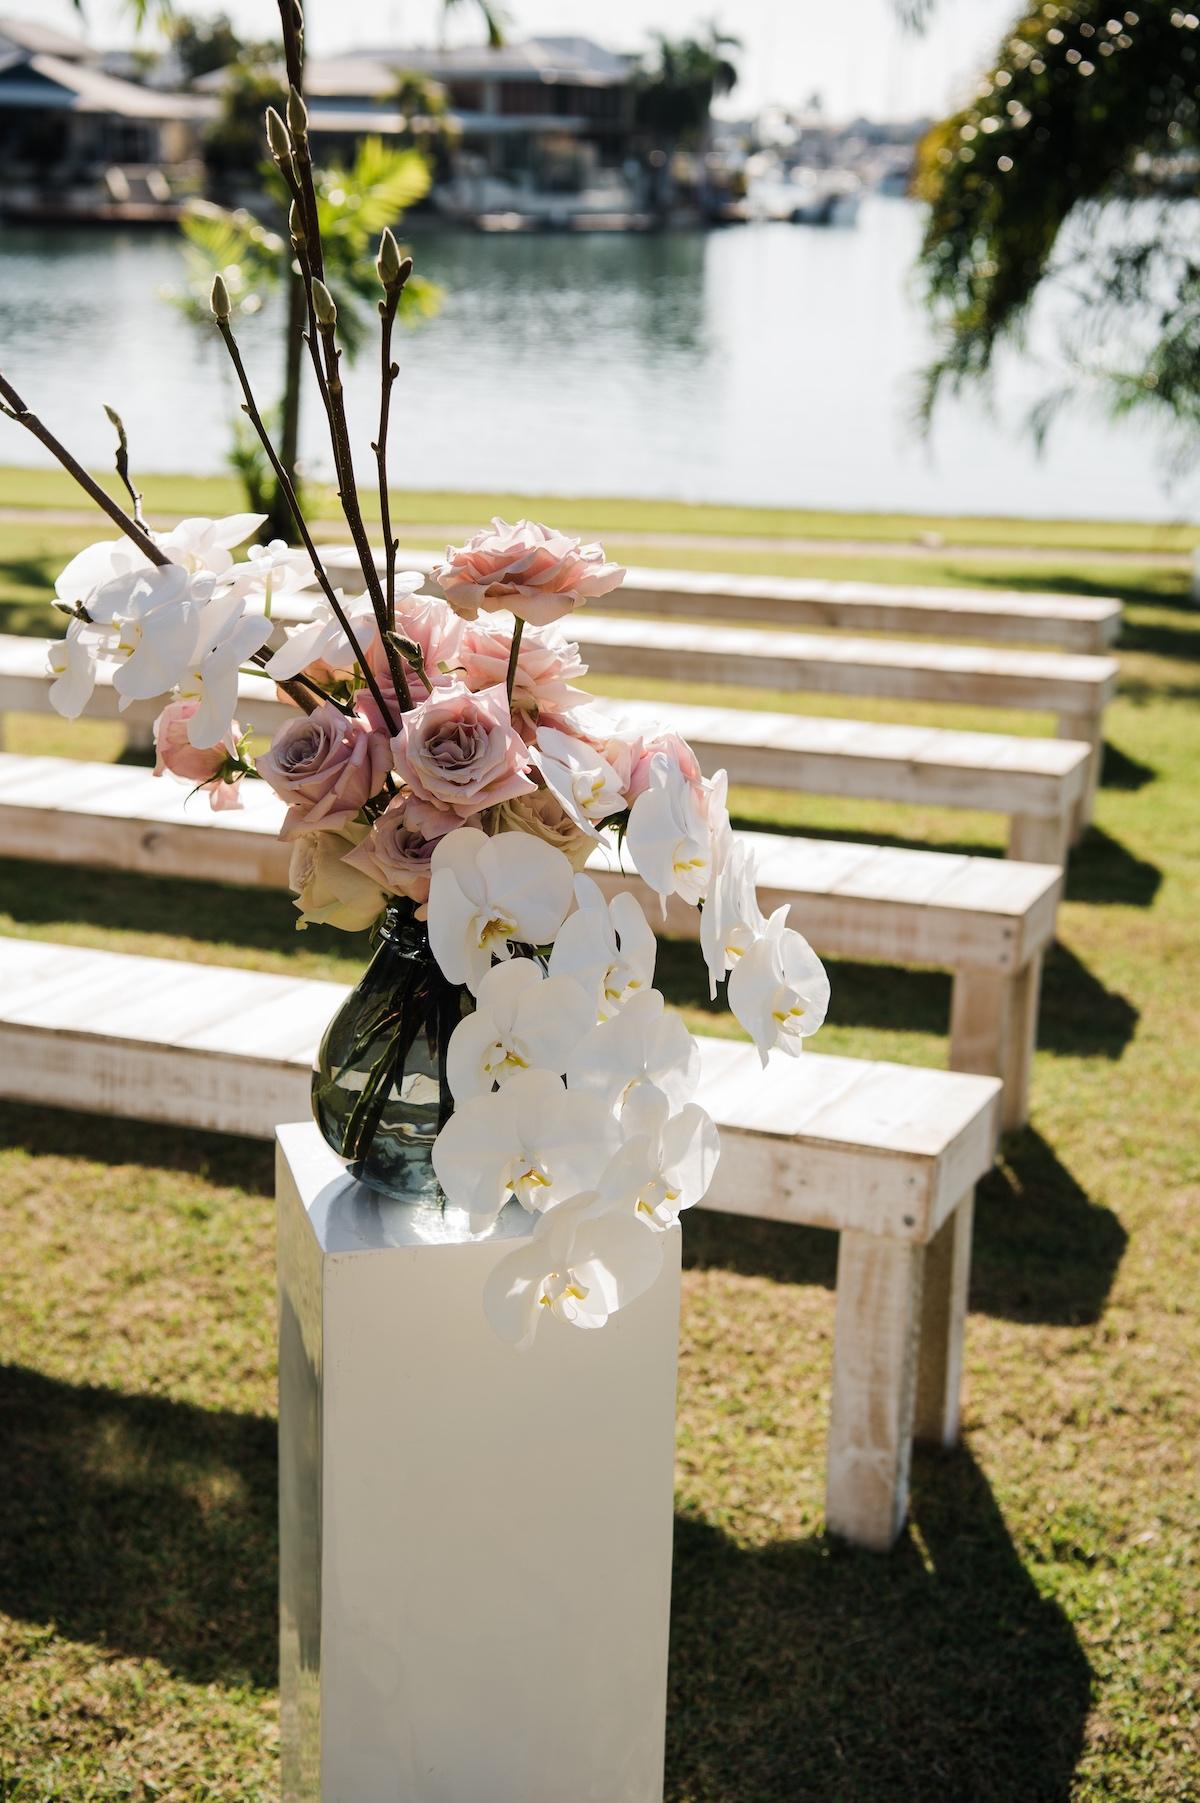 freestanding floral display for wedding entrance